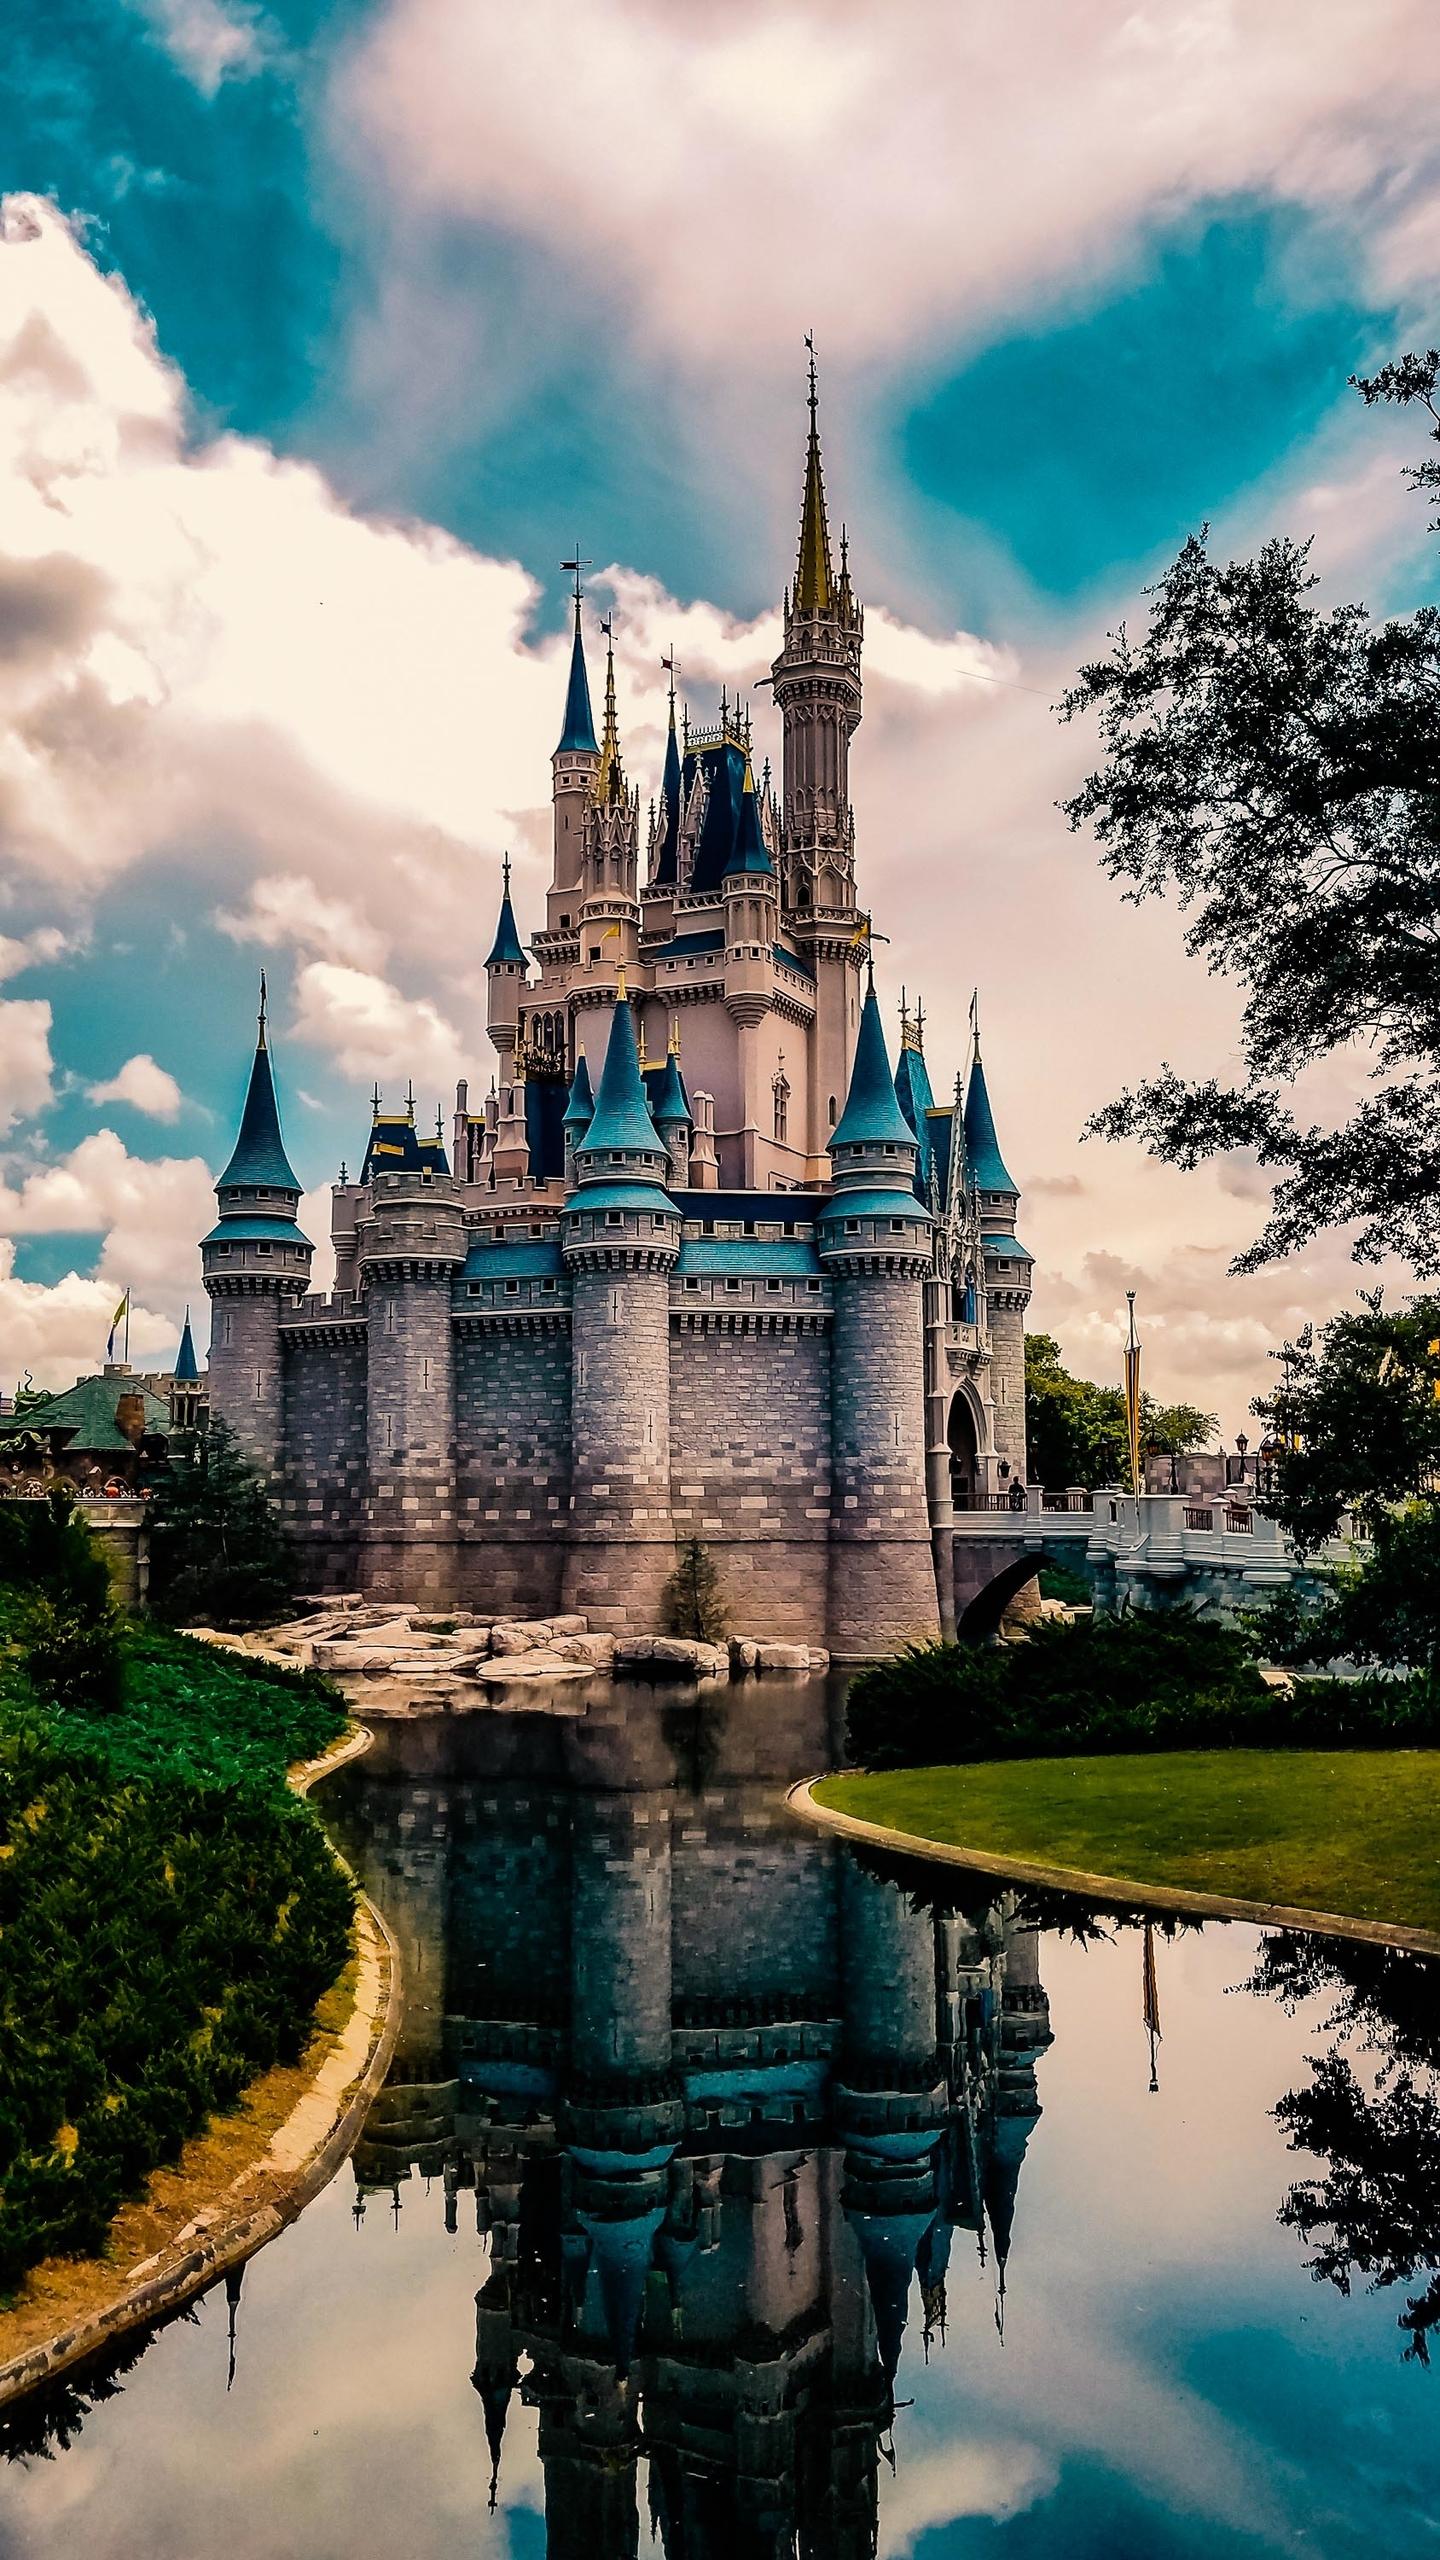 Man Made/Disney World (1440x2560) Wallpaper ID: 741694 ...